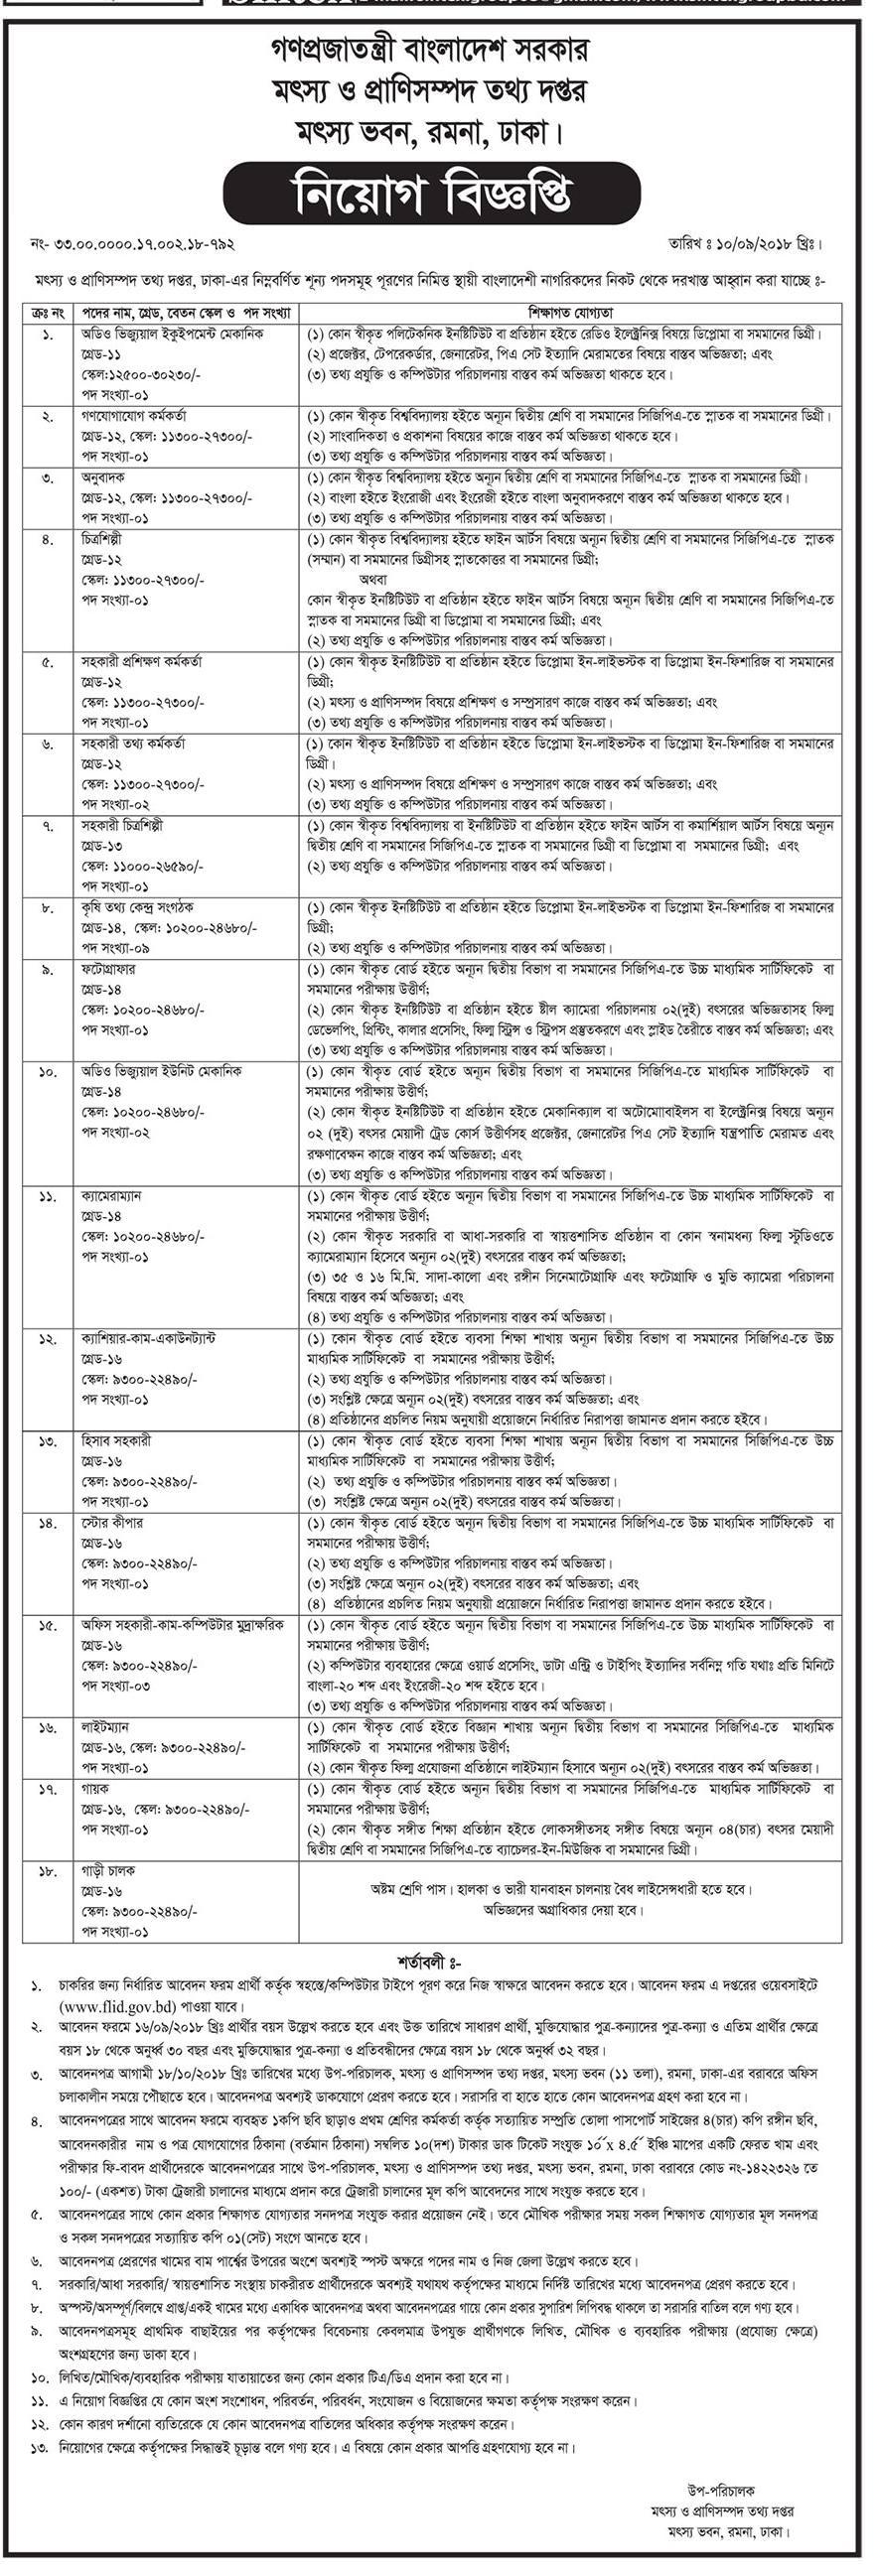 Ministry of Fisheries and Livestock Job Circular 2018